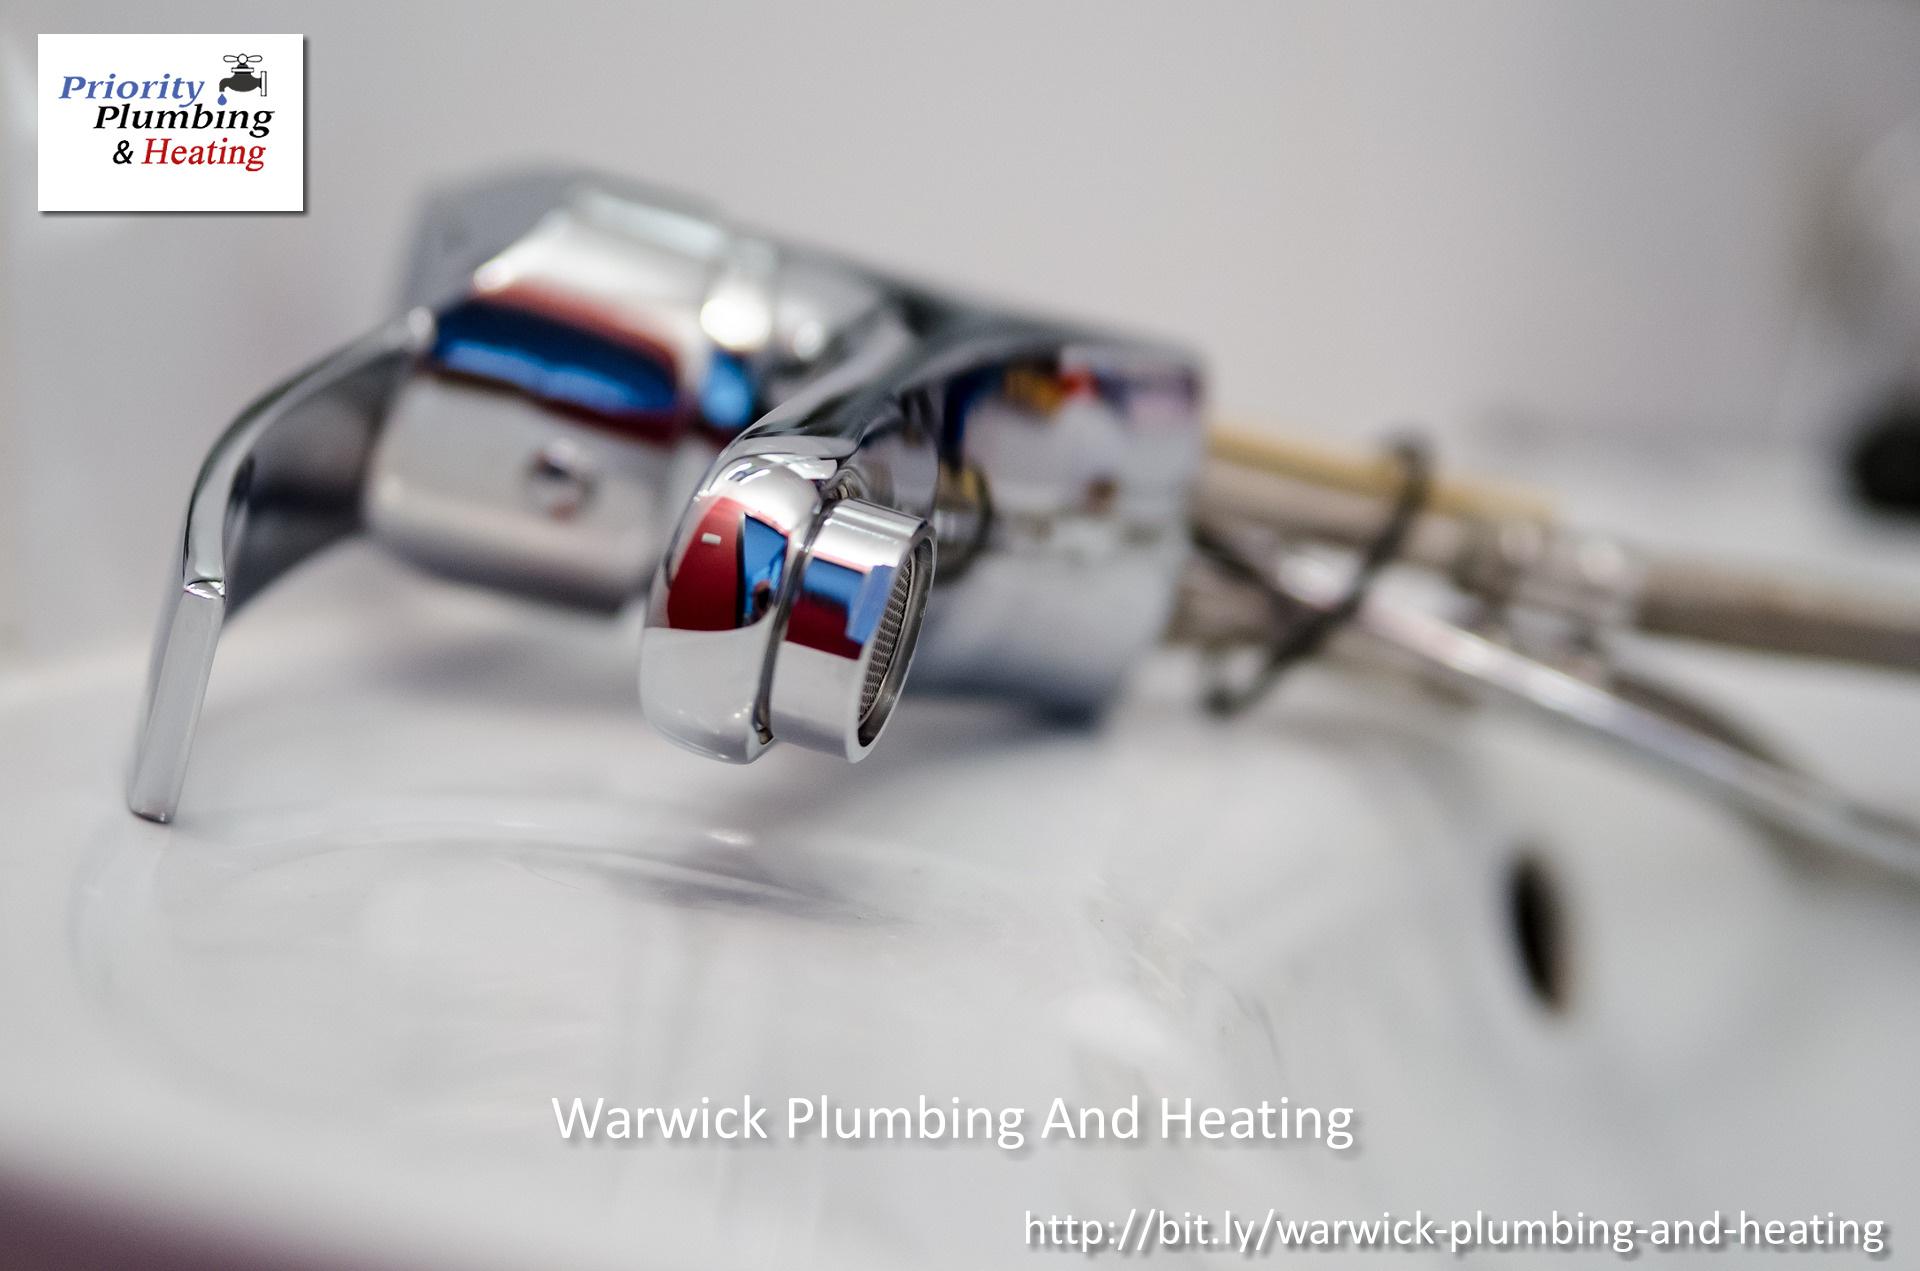 Priority Plumbing & Heating Outlines Signs for Water Heater Repair